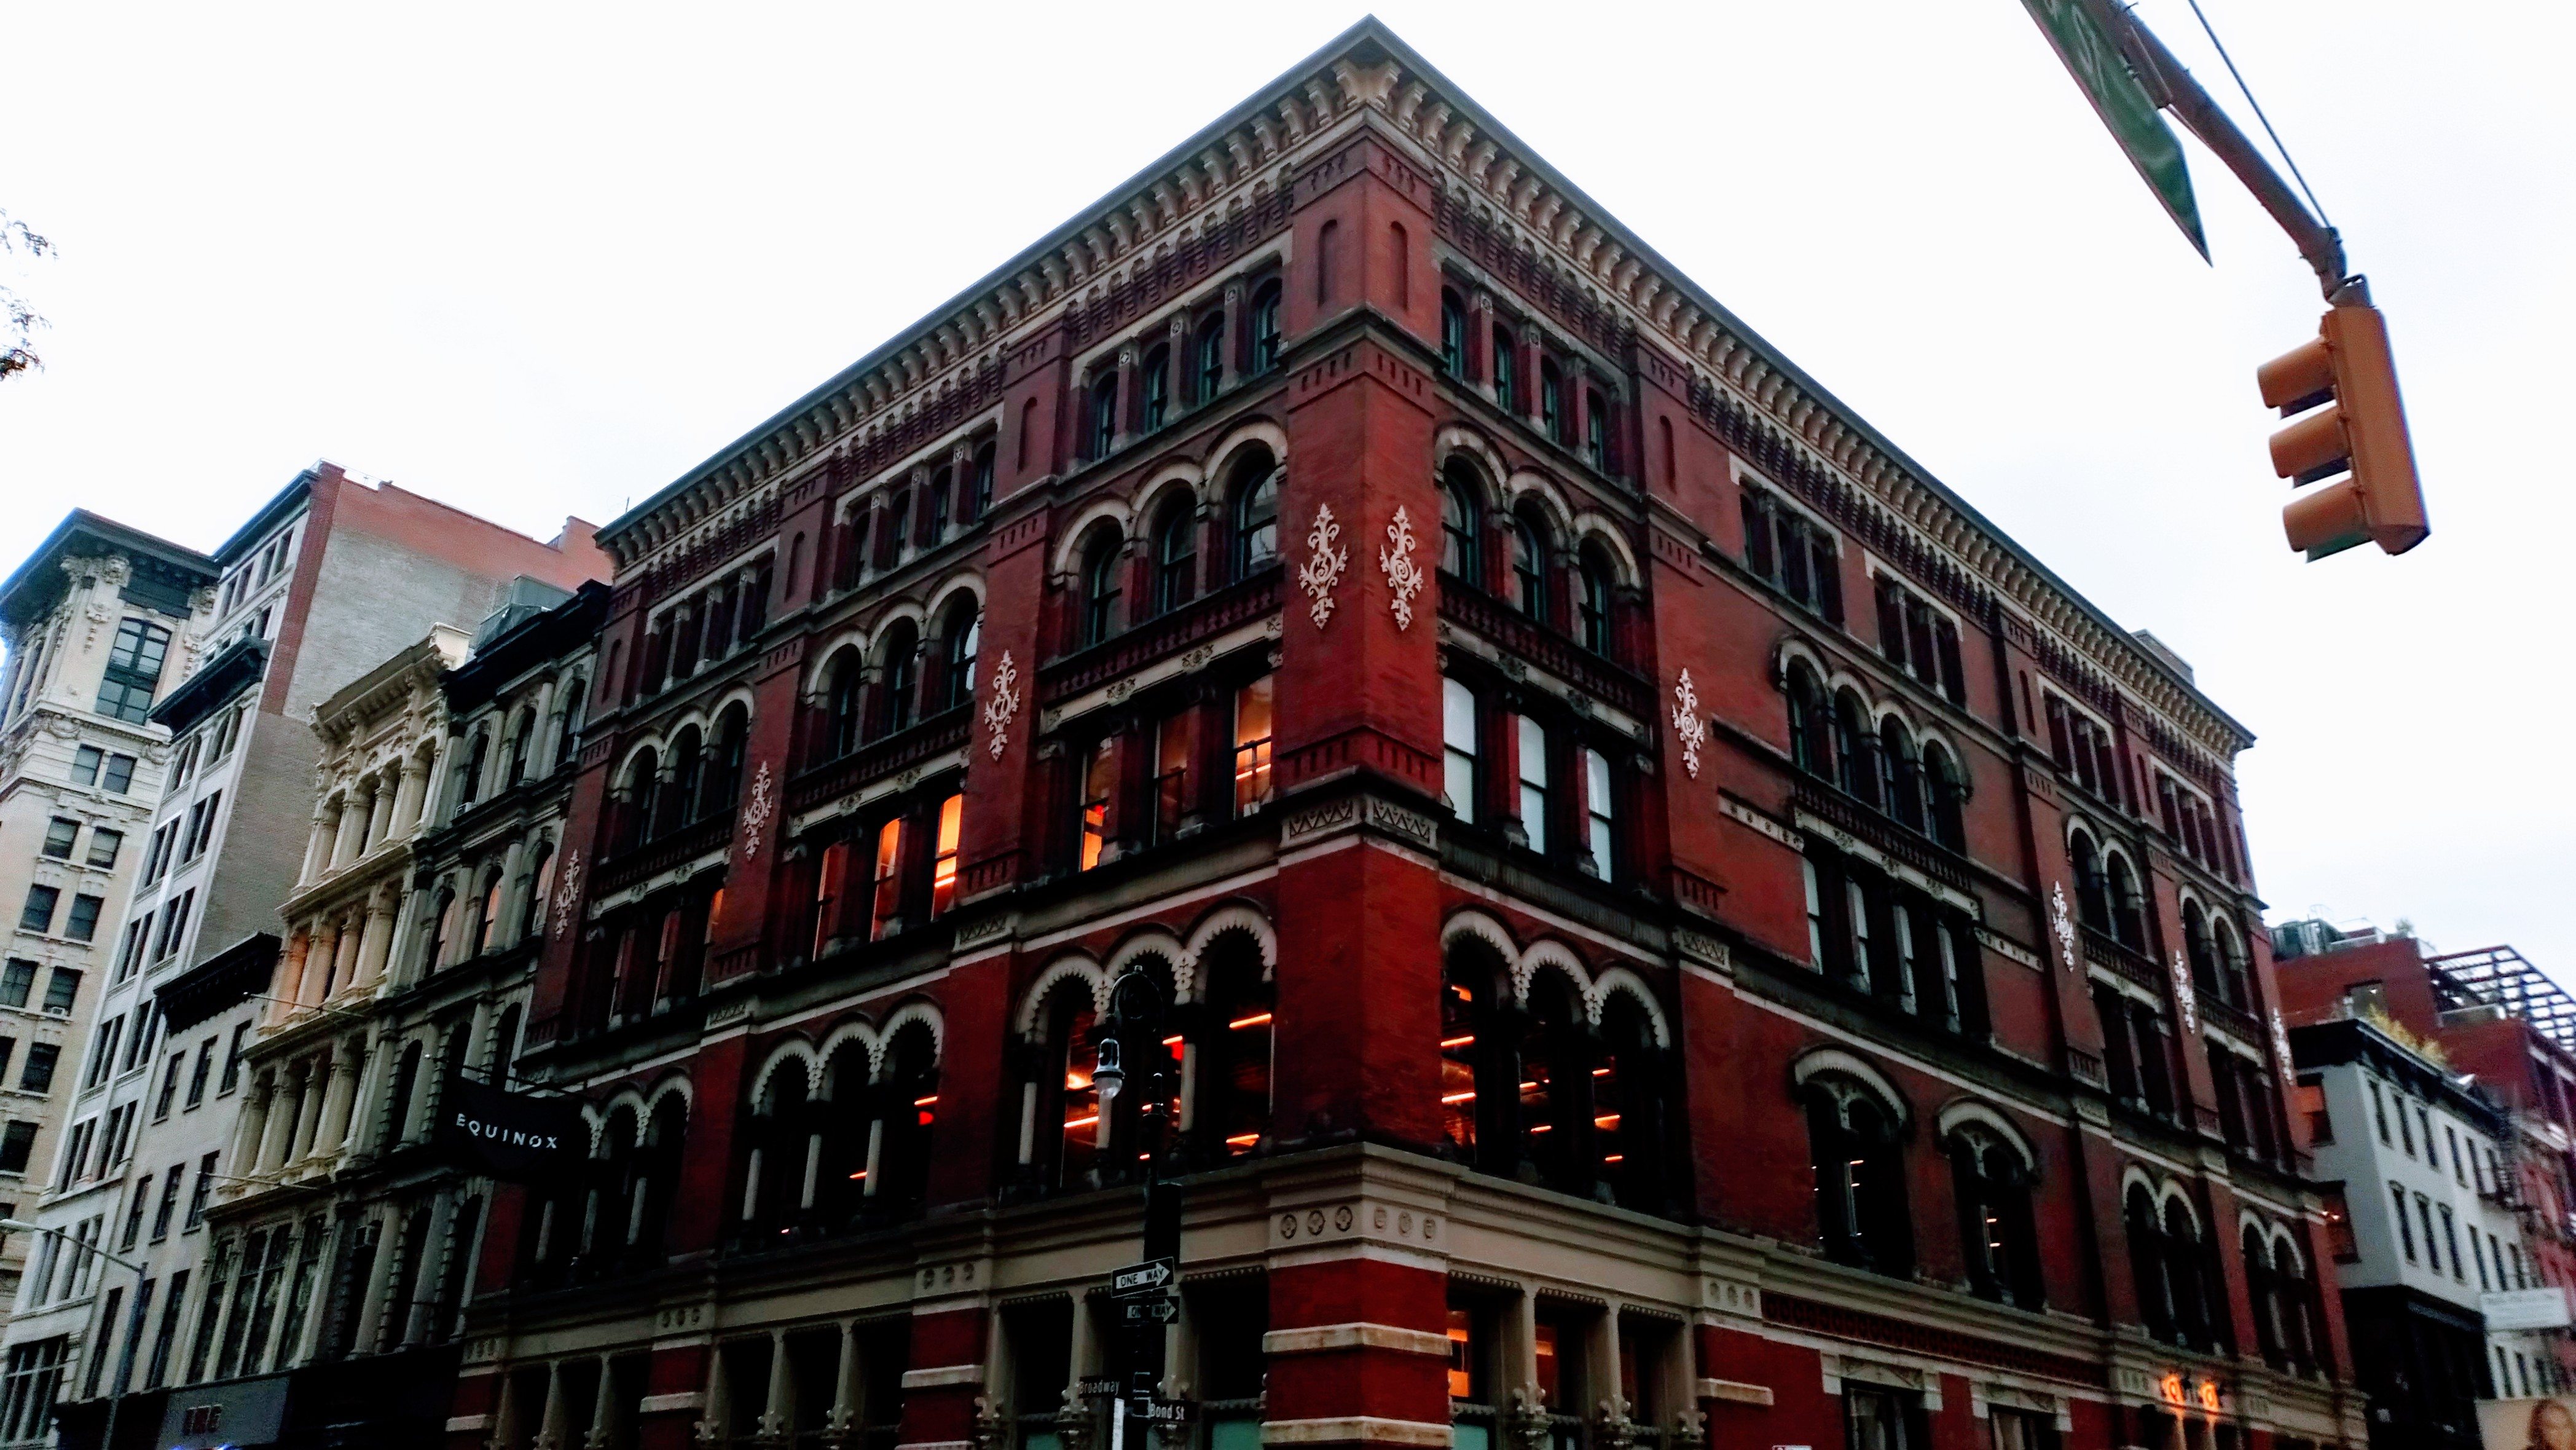 File:NYC - Bond street - Broadway Intersection - Equinox jpg